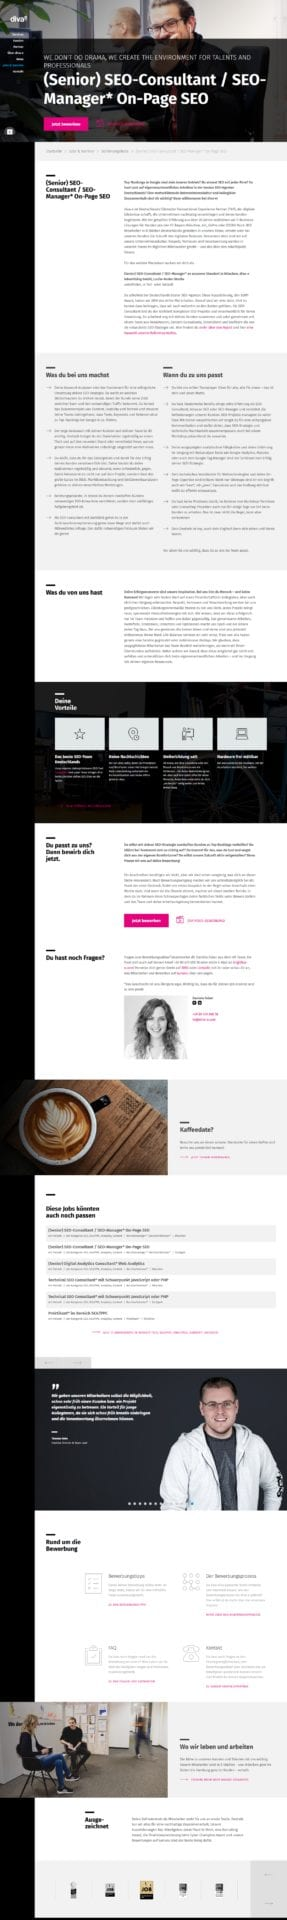 Stellenanzeige bei diva-e - Kaffee-Date und Bewerbungsinfos inklusive